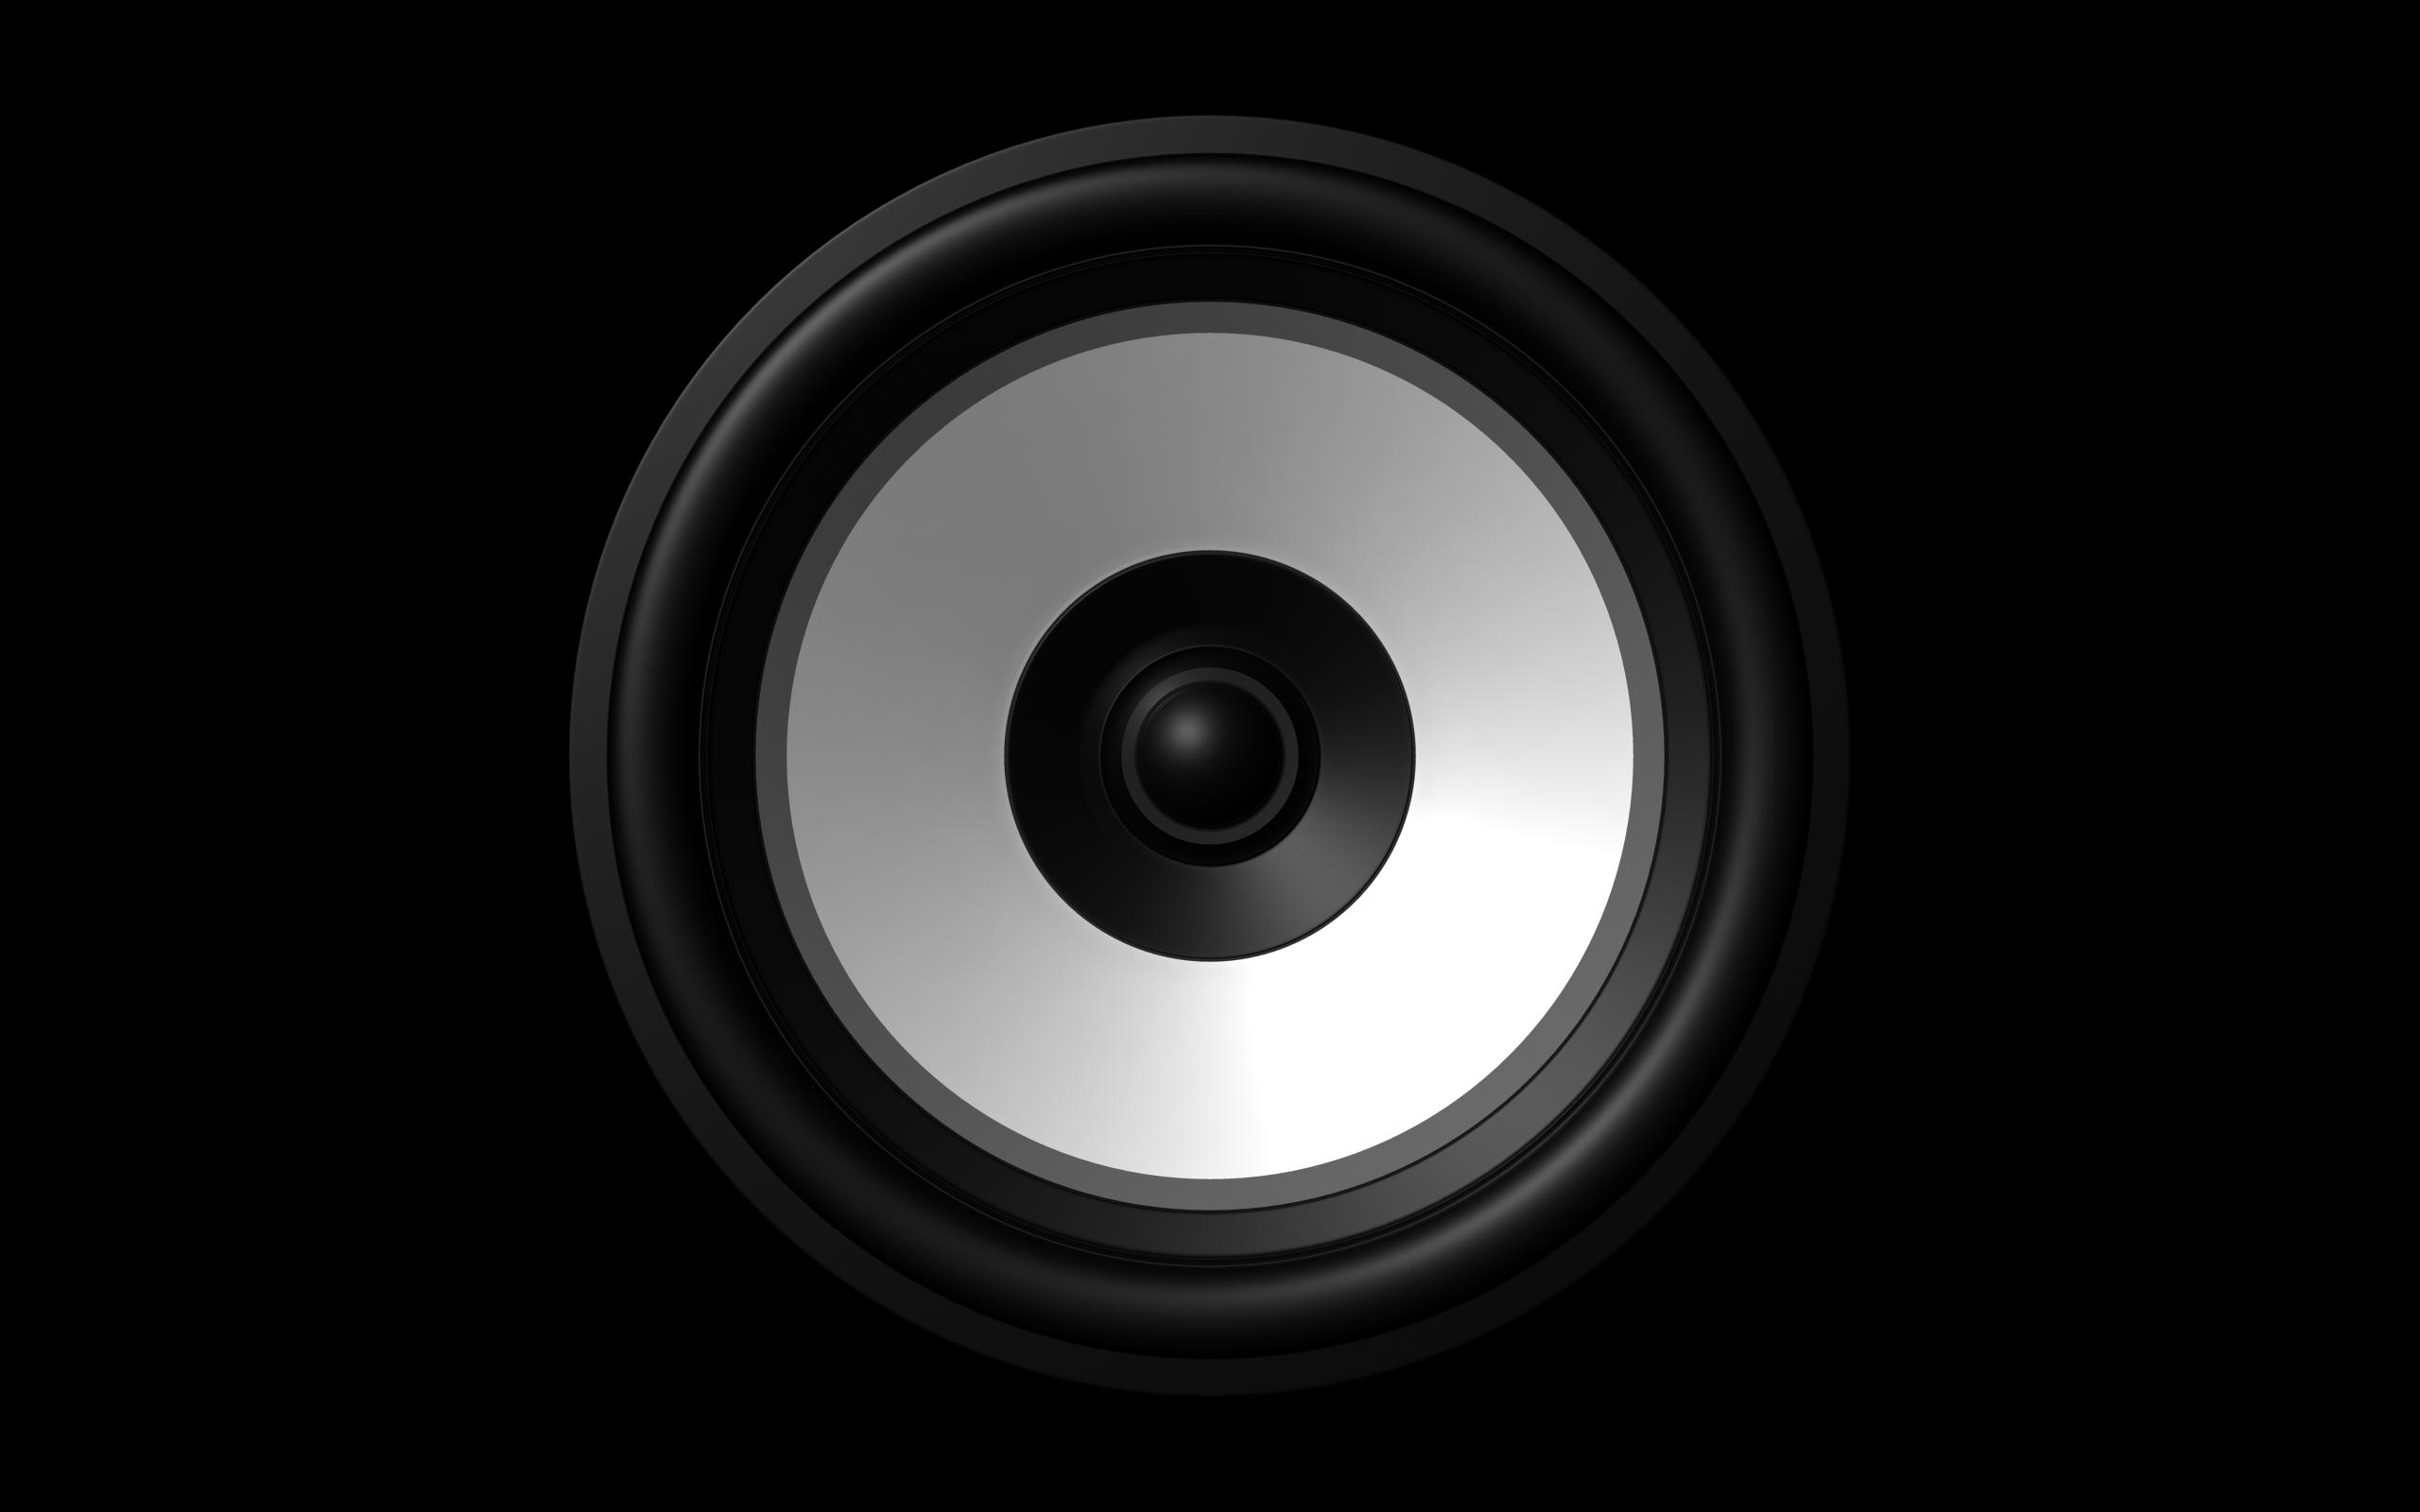 Speaker HD PNG